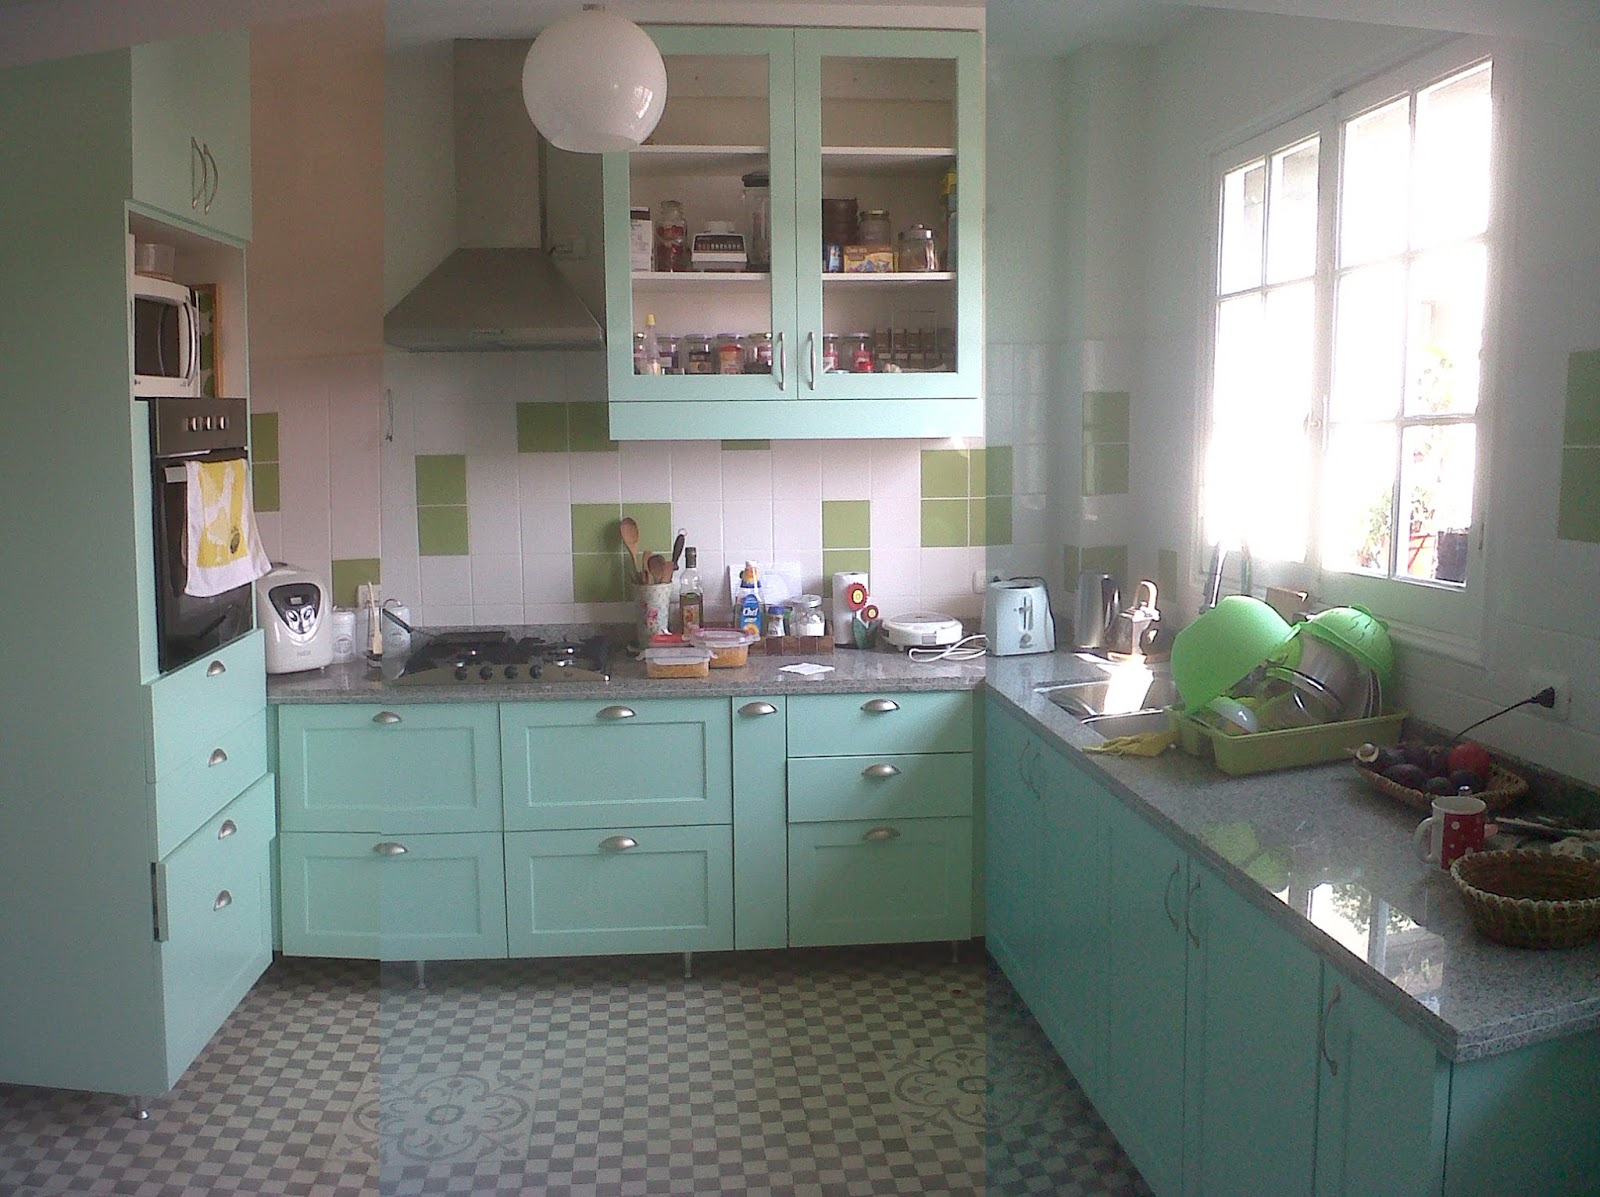 Cocinas con dise o vintagel casa dise o - Cocinas retro vintage ...